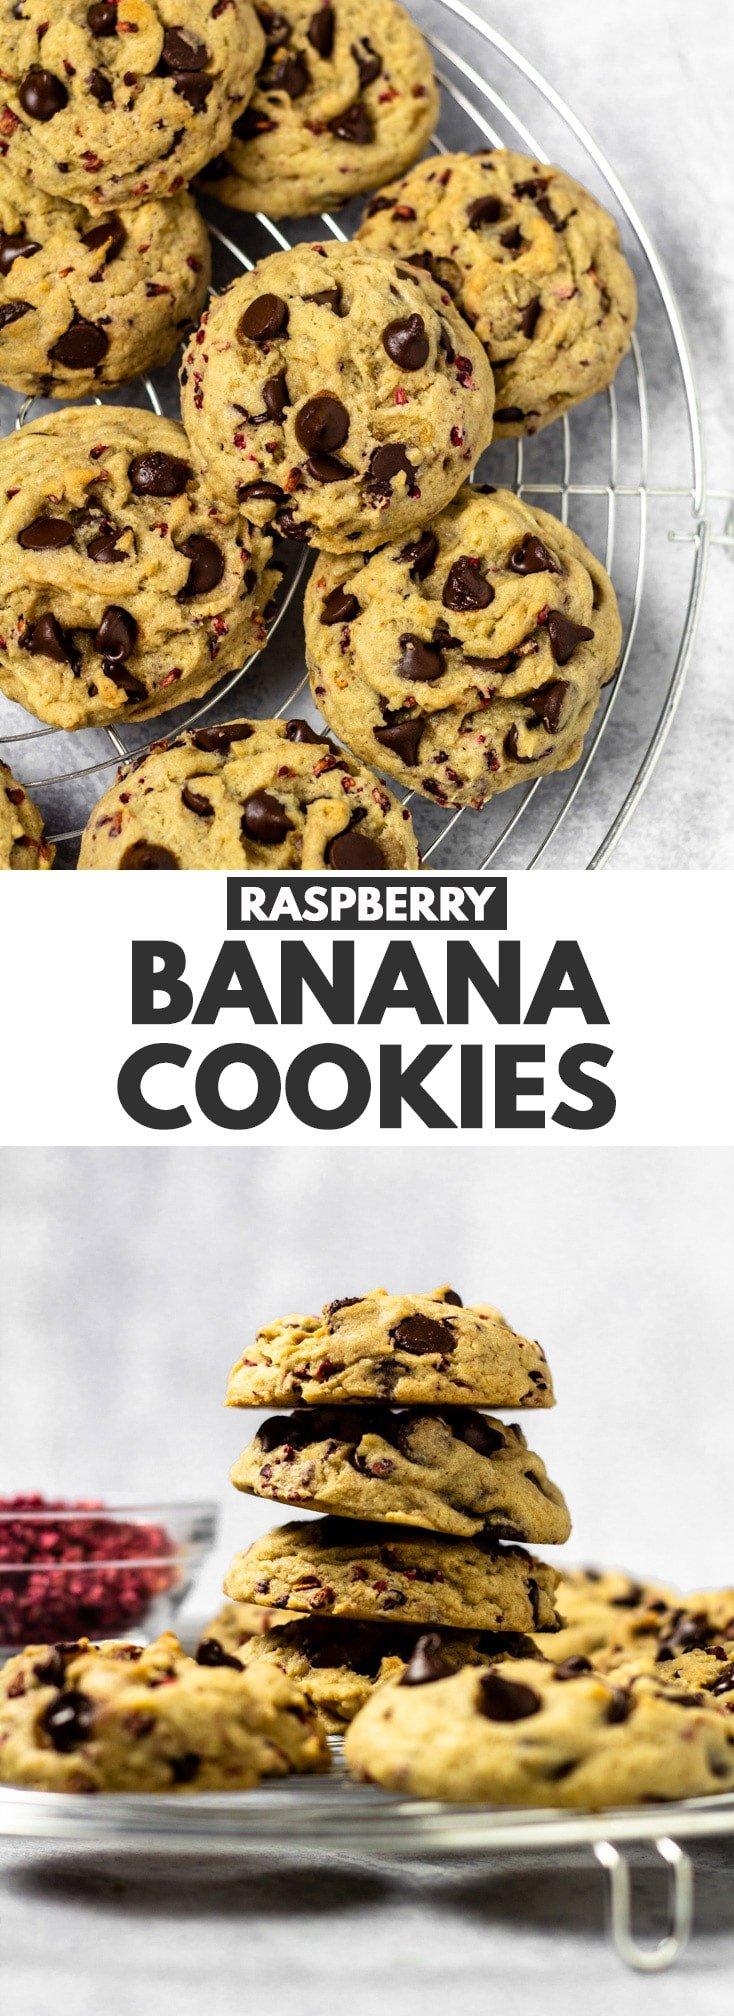 Raspberry Banana Cookies